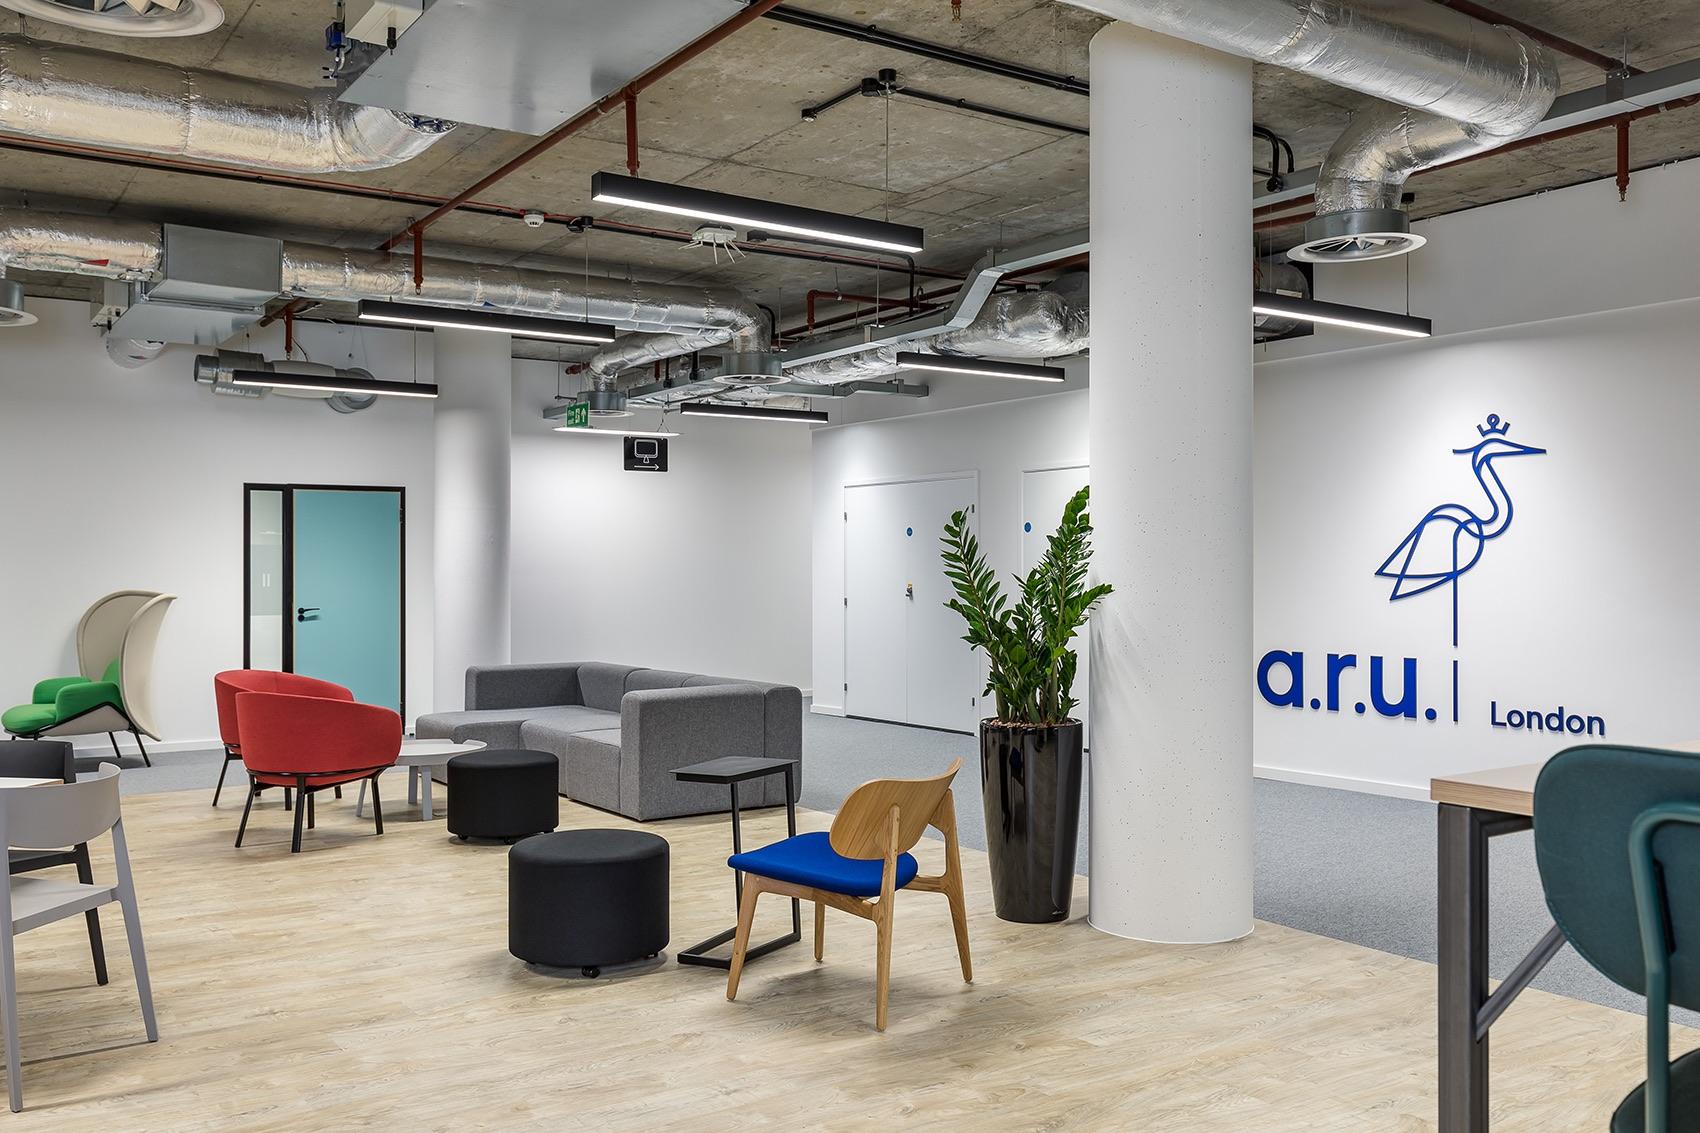 anglia-ruskin-university-office-london-17